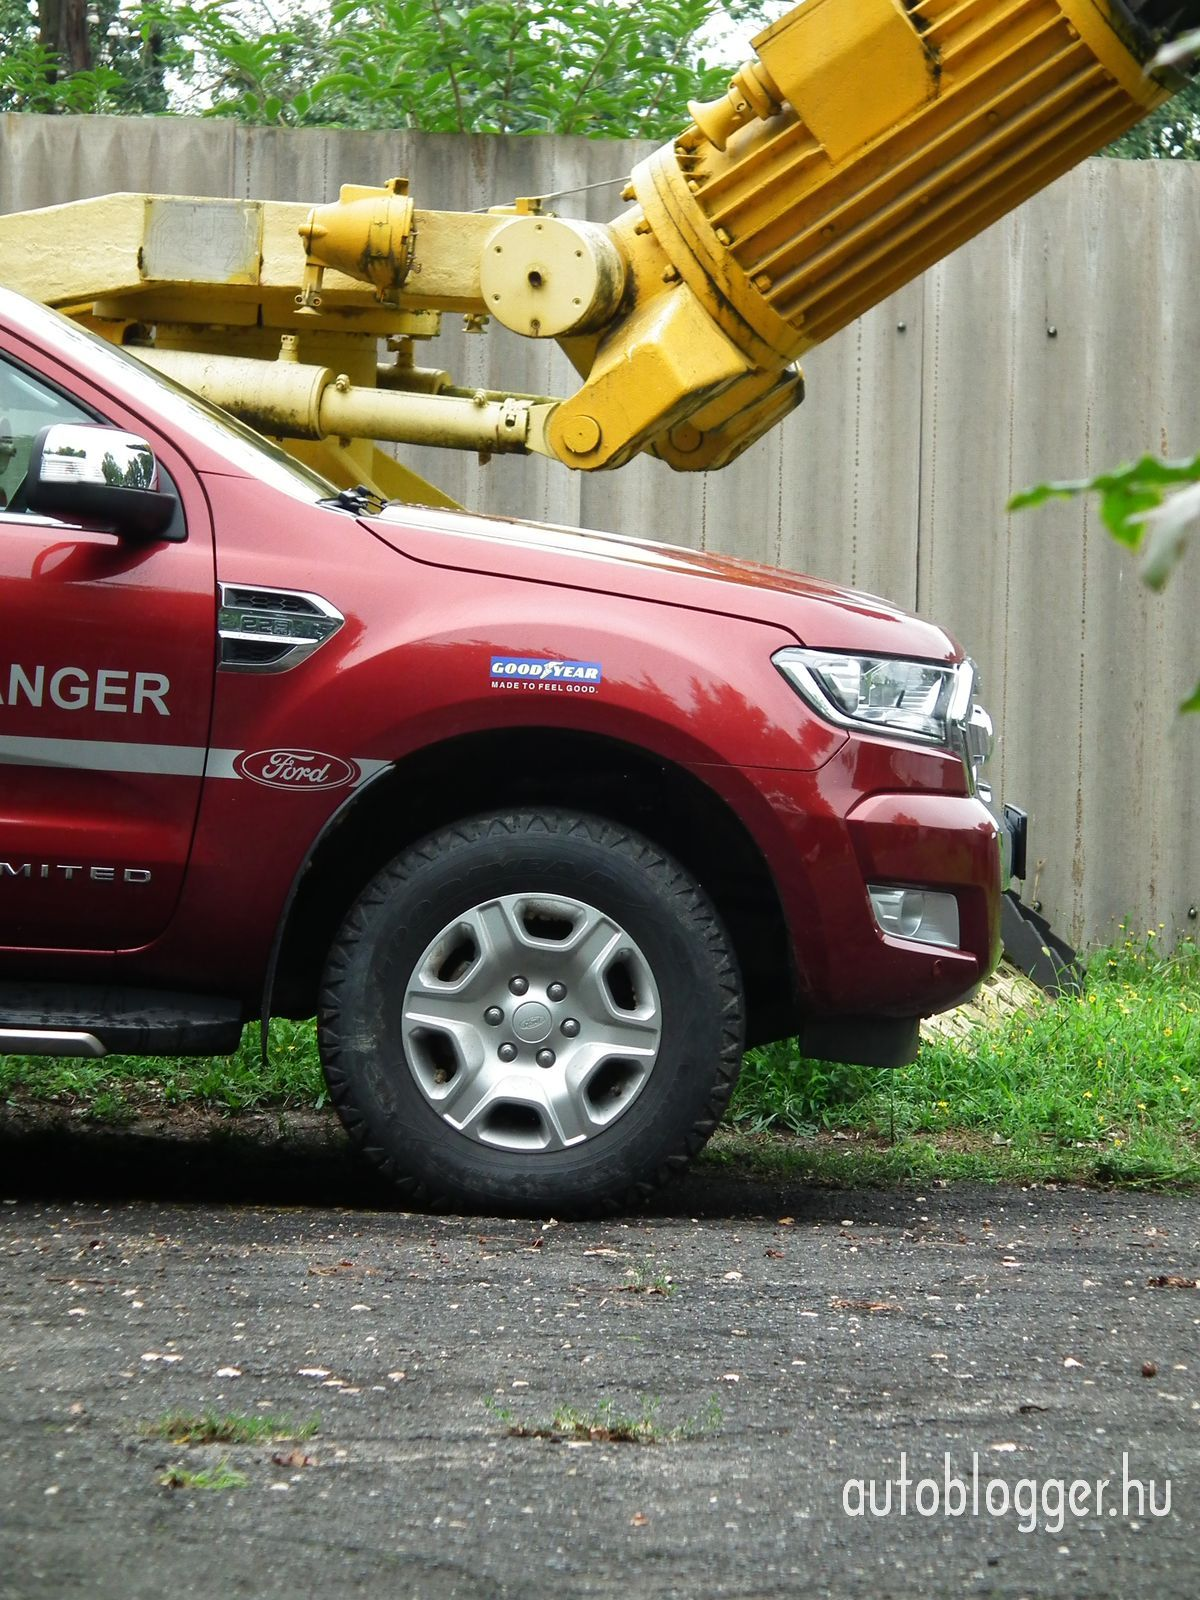 Ford_Ranger_Teszt_Autoblogger.hu_b0036455